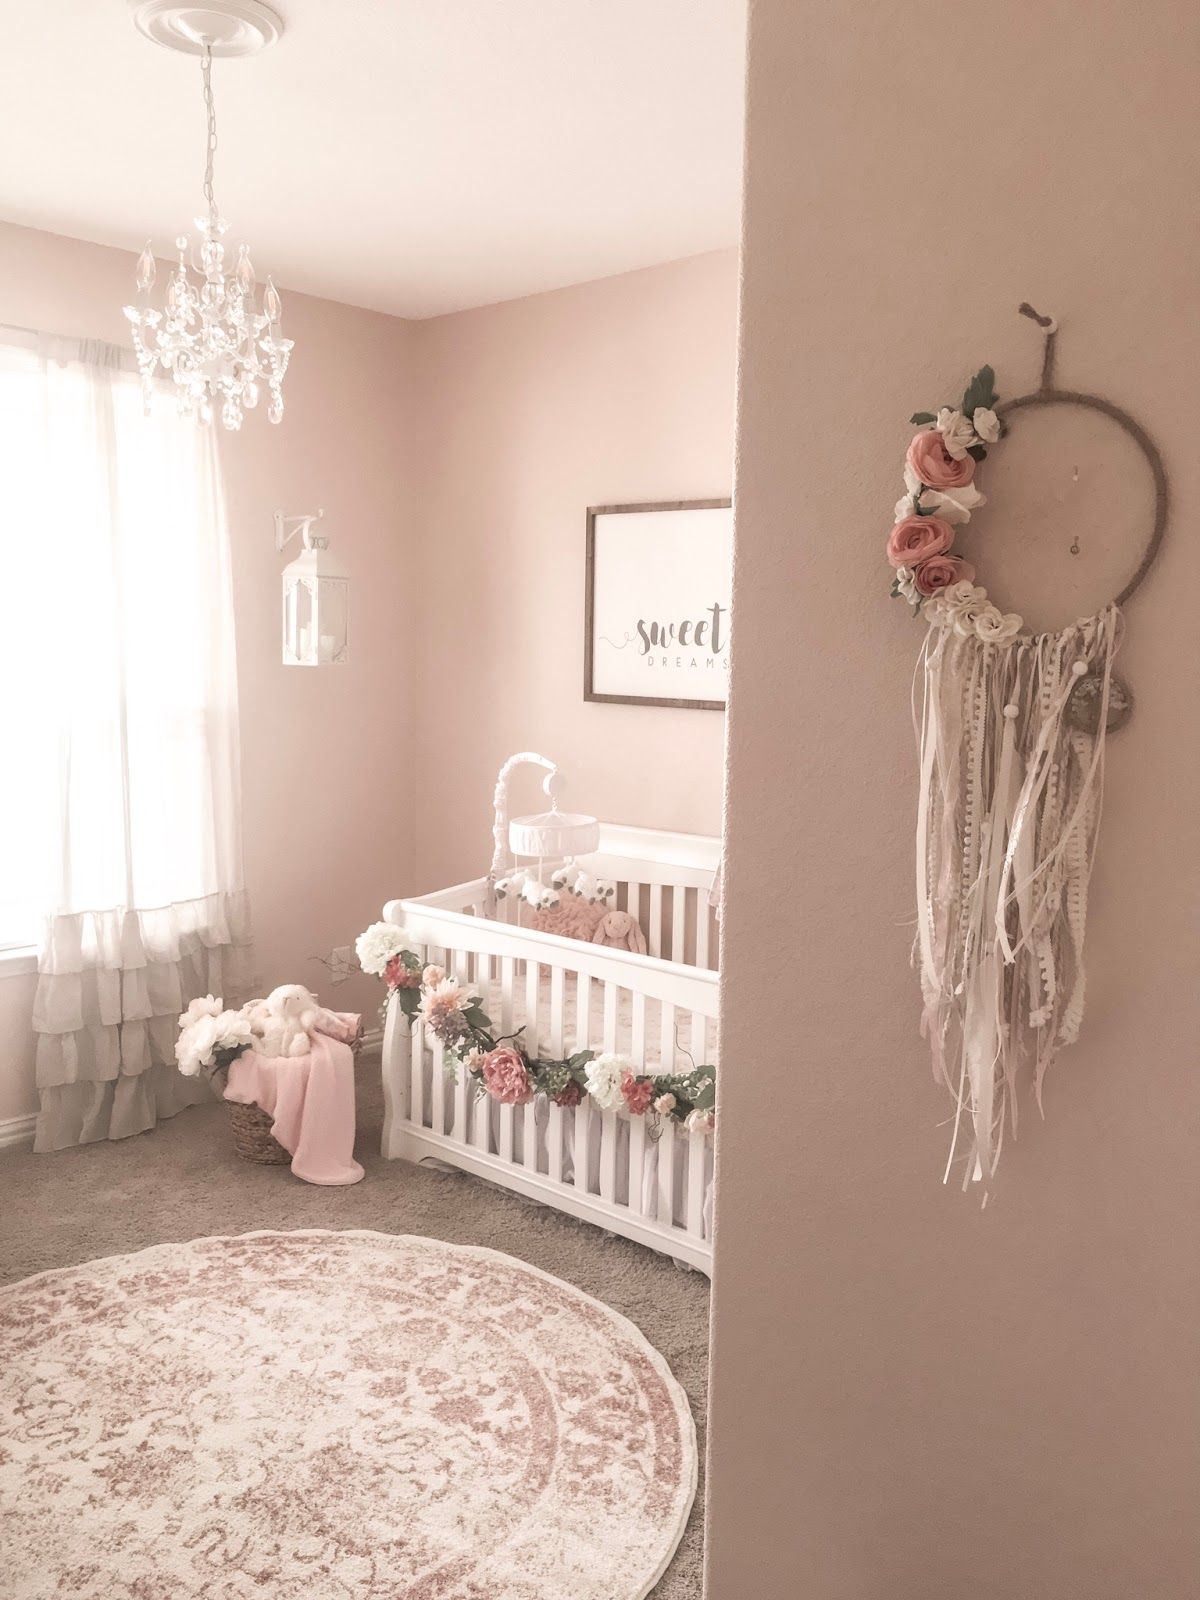 Baby Ava S Nursery Reveal Nursery Baby Room Girl Nursery Room